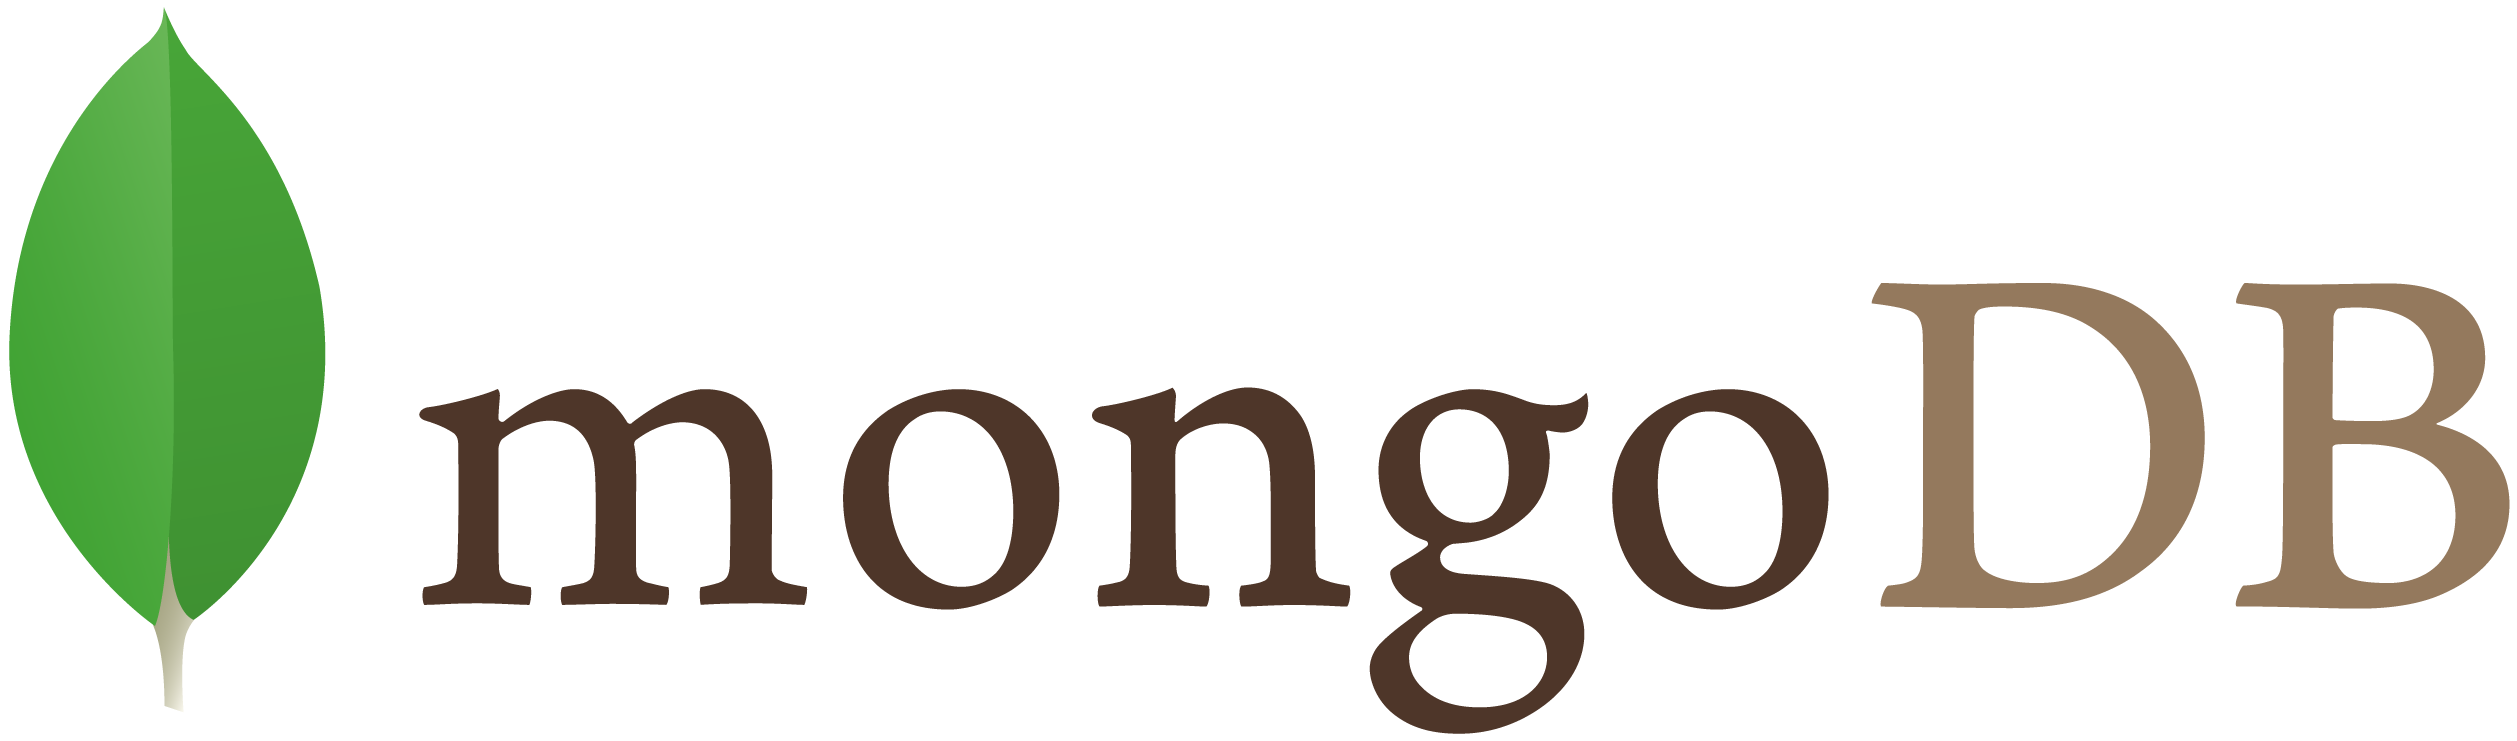 mongodb_logo_transparent